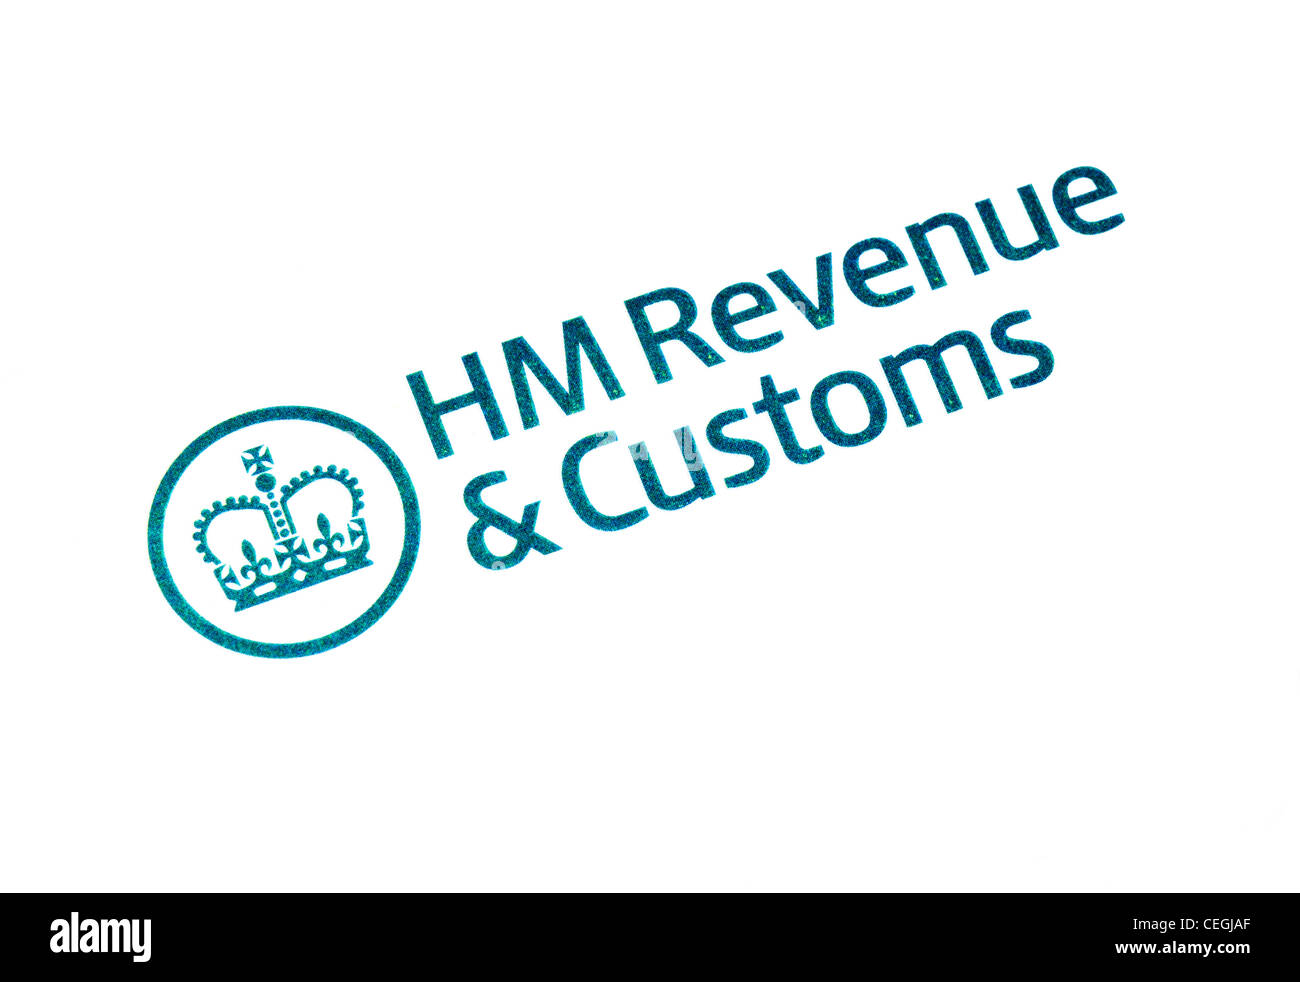 HM Revenue & Customs logo - Stock Image